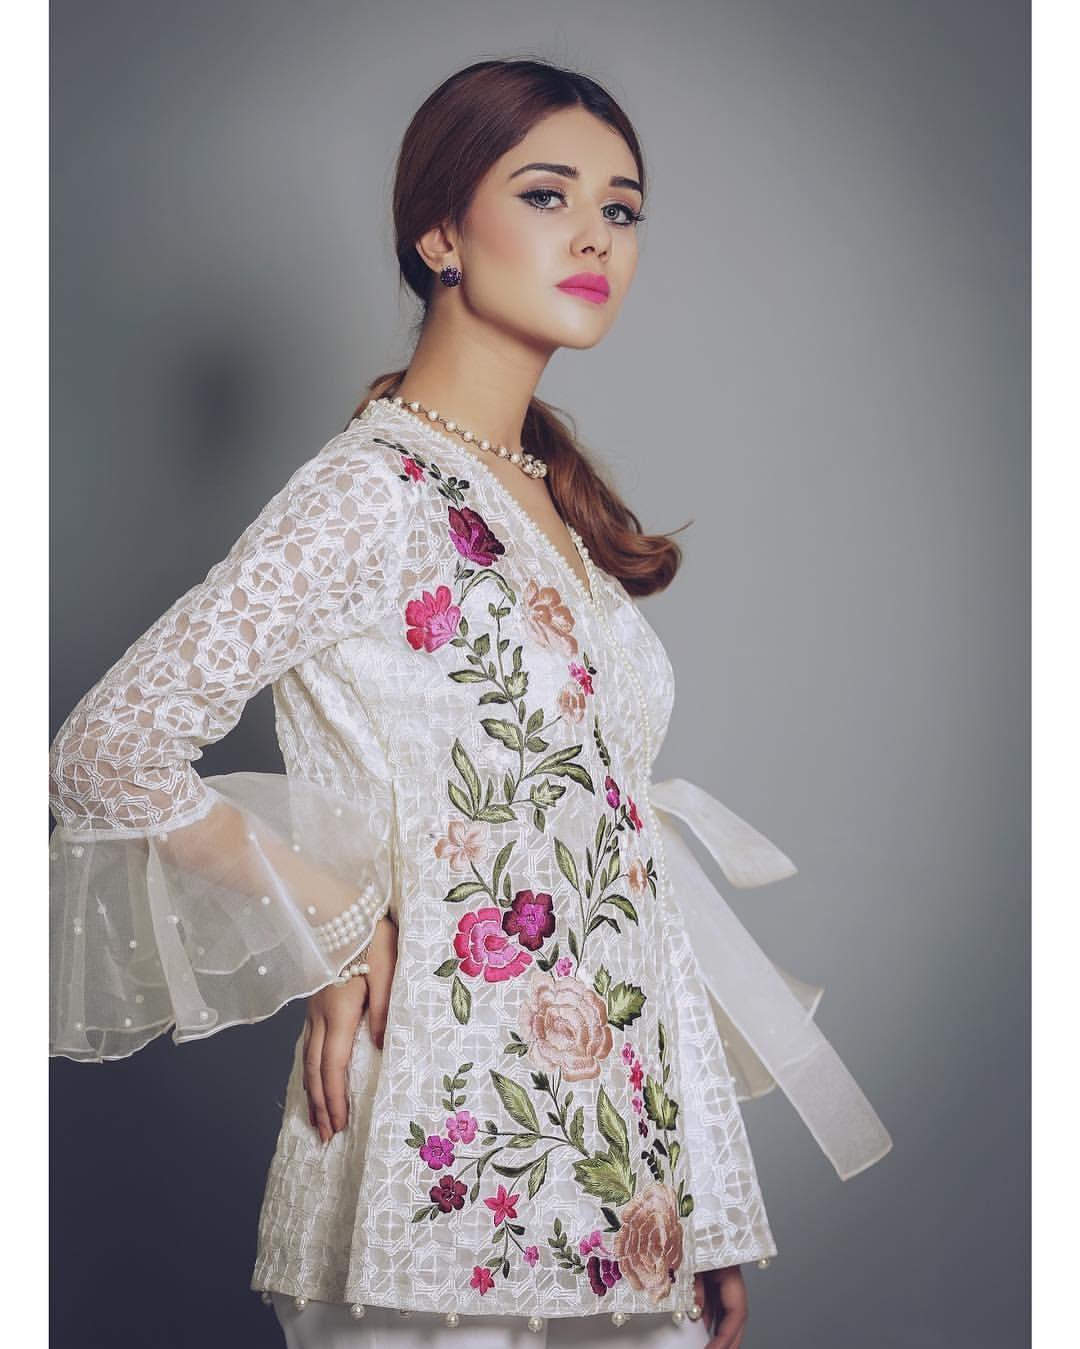 Pin By Armish Nasir On Fashion In 2019